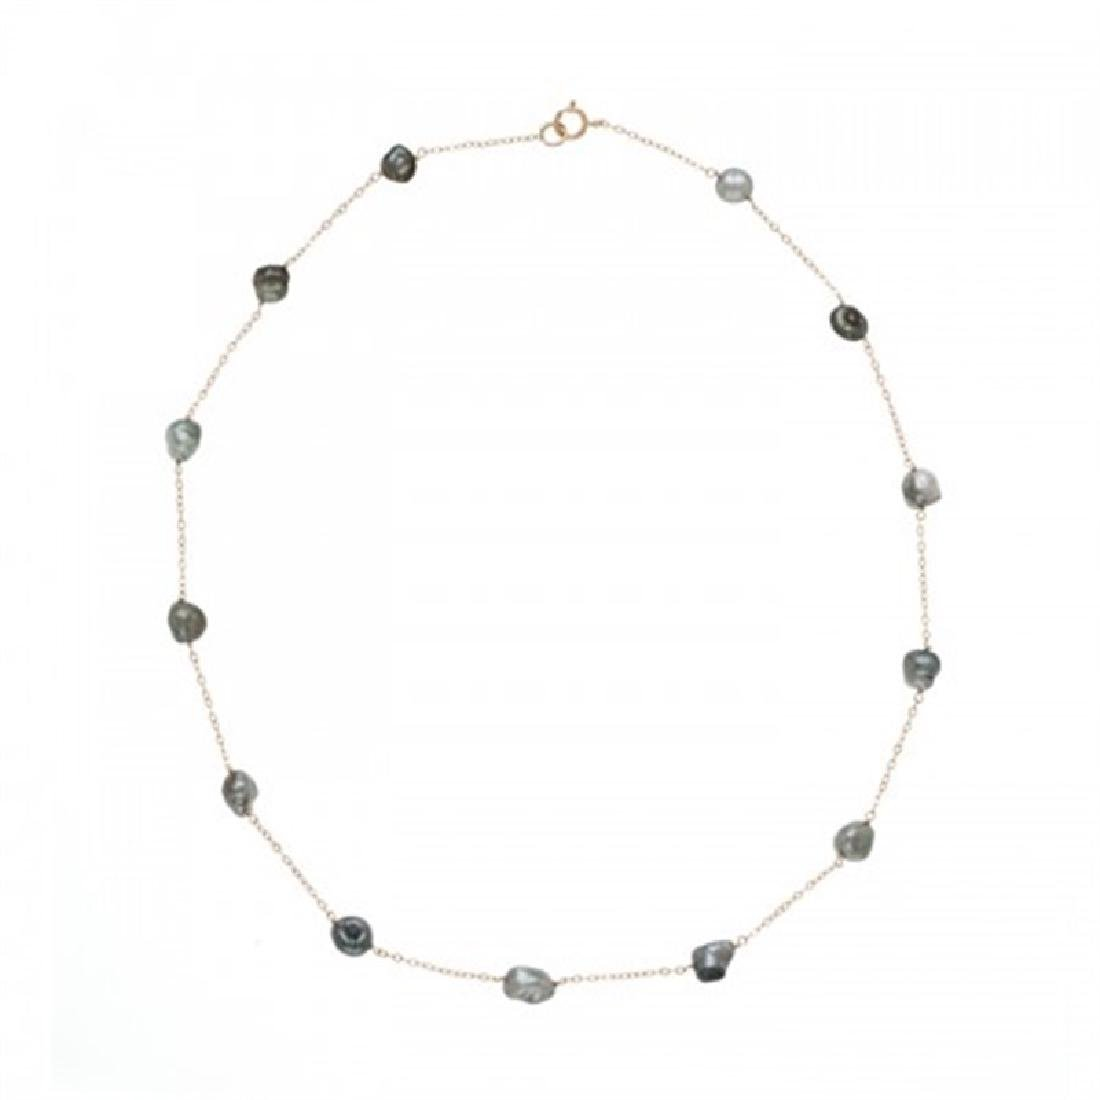 6.0-7.0mm Tahitian Keshi Tin Cup Pearl Necklace